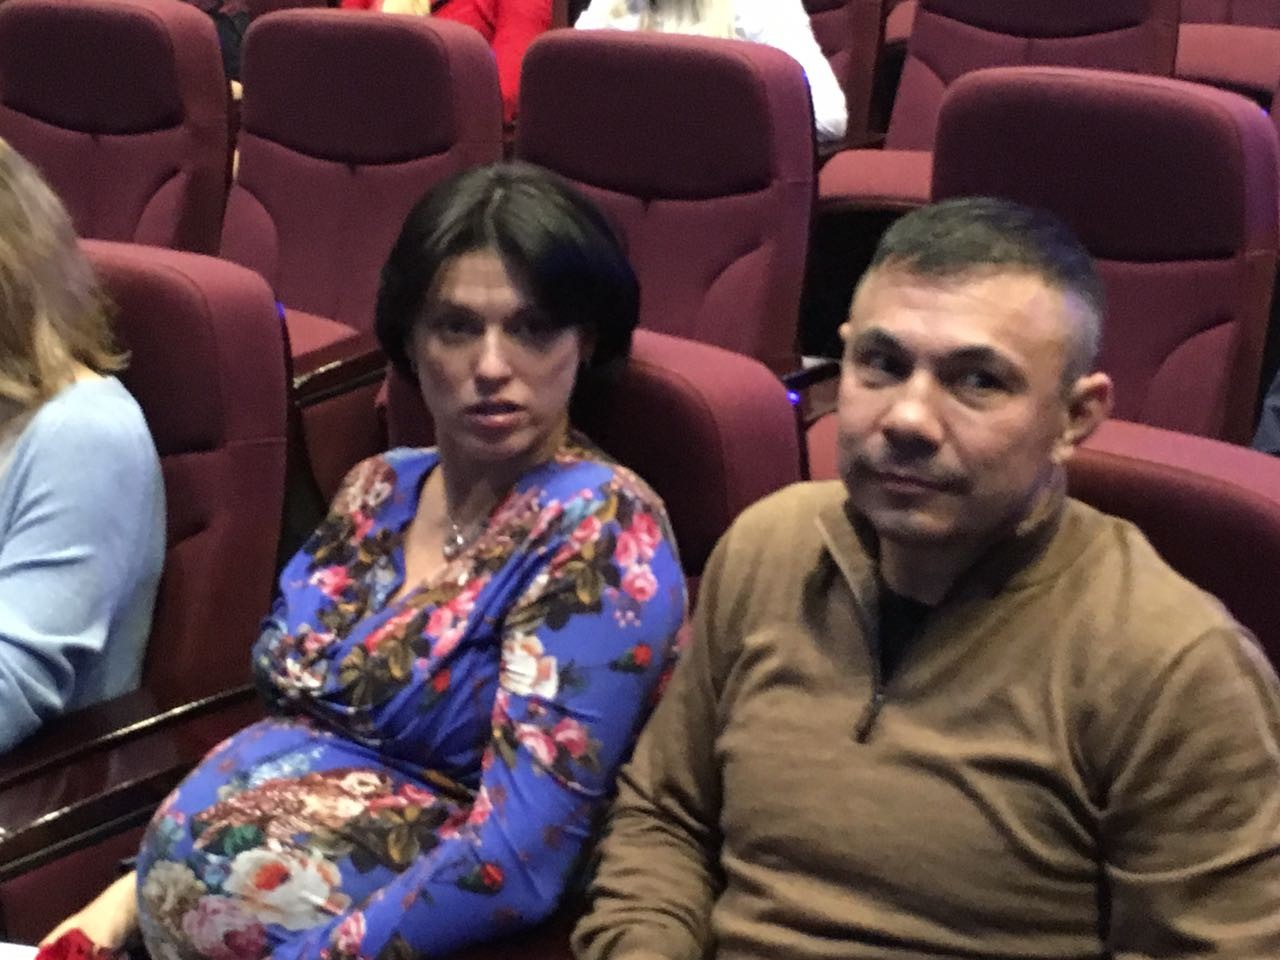 <p>Костя Цзю с супругой Татьяной Авериной</p> <p>Фото: L!FE</p>